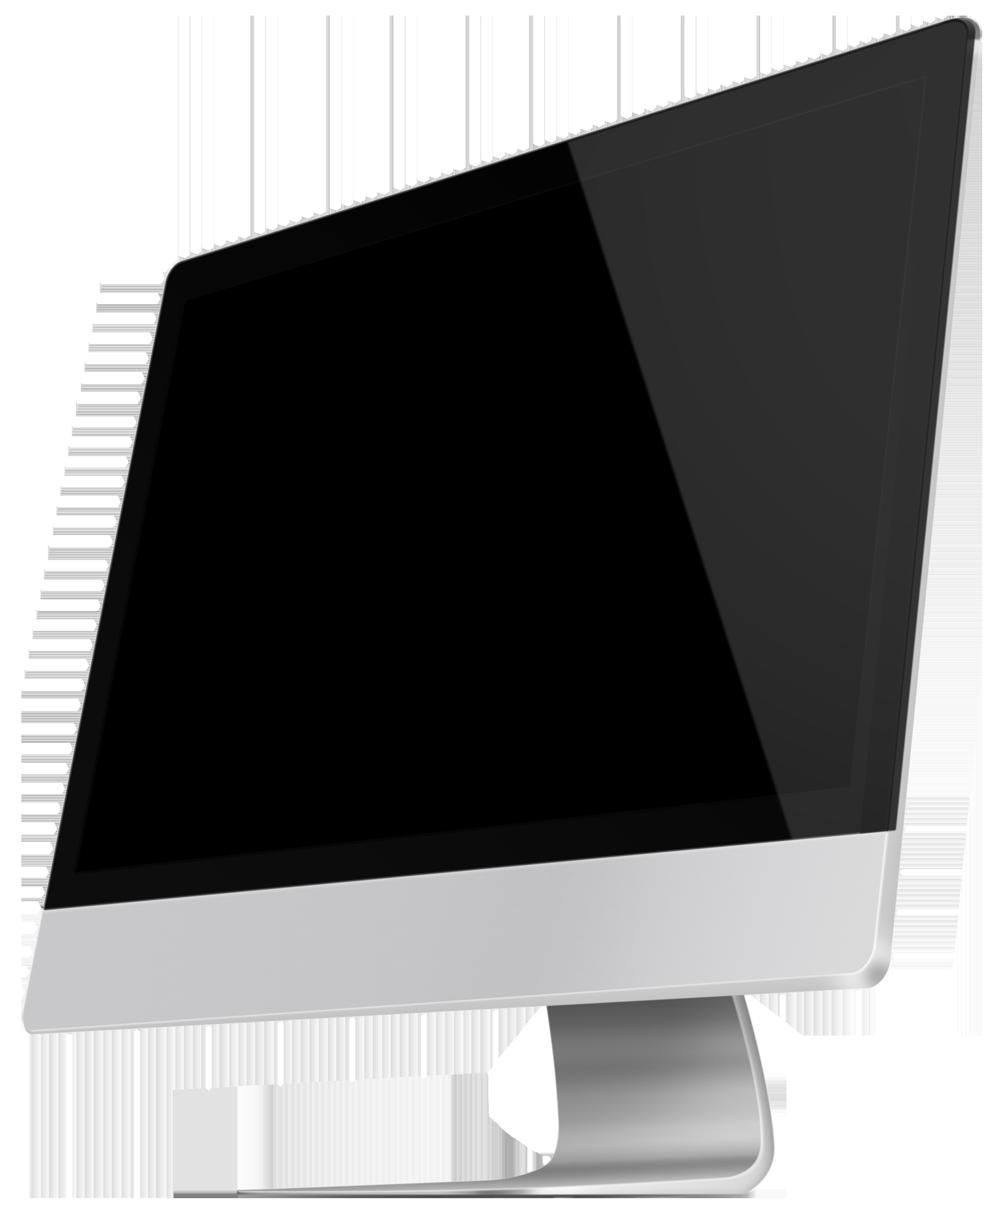 Mac computer device